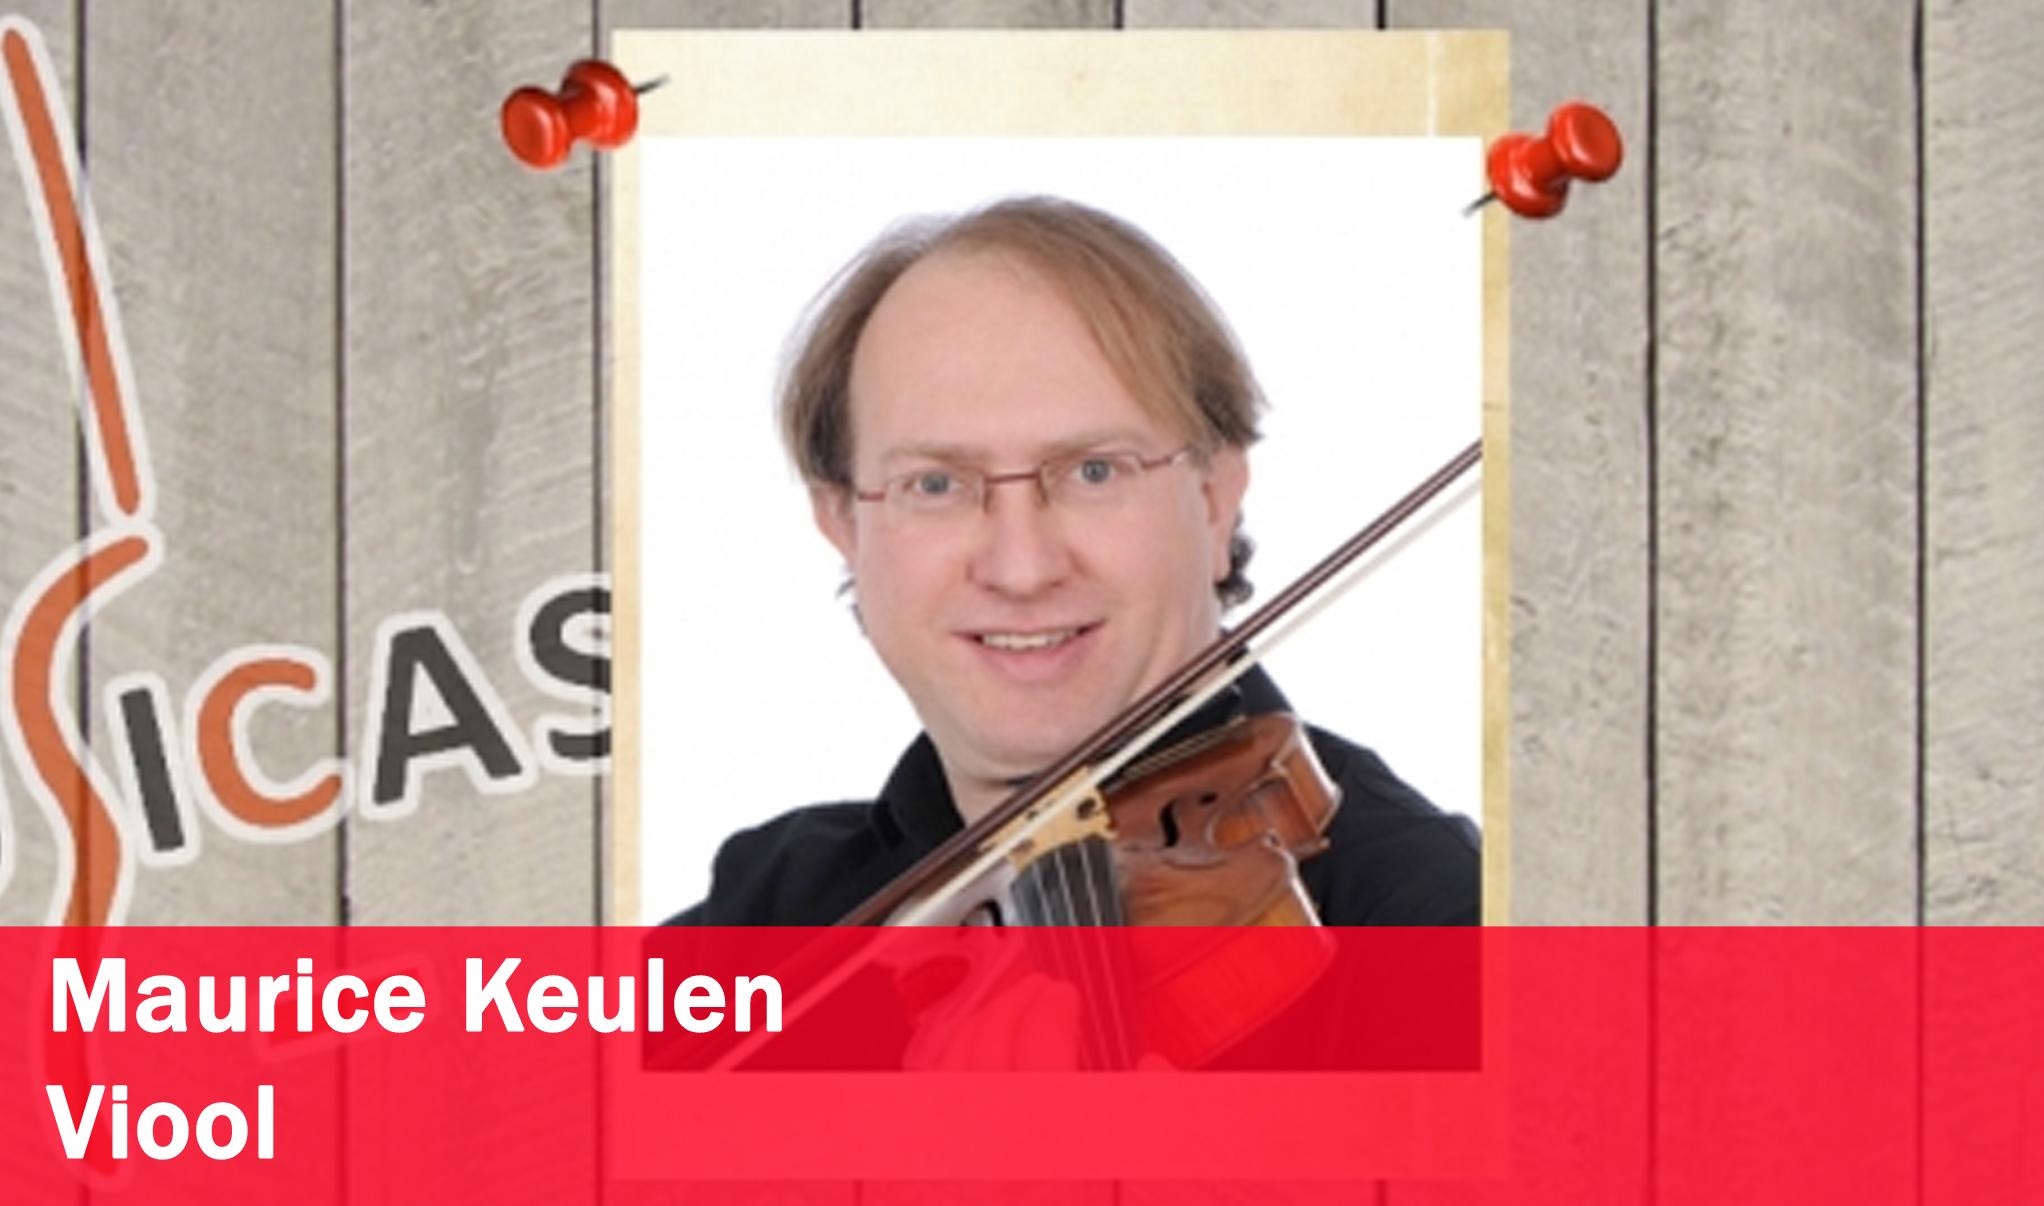 Maurice Keulen <br>Viool